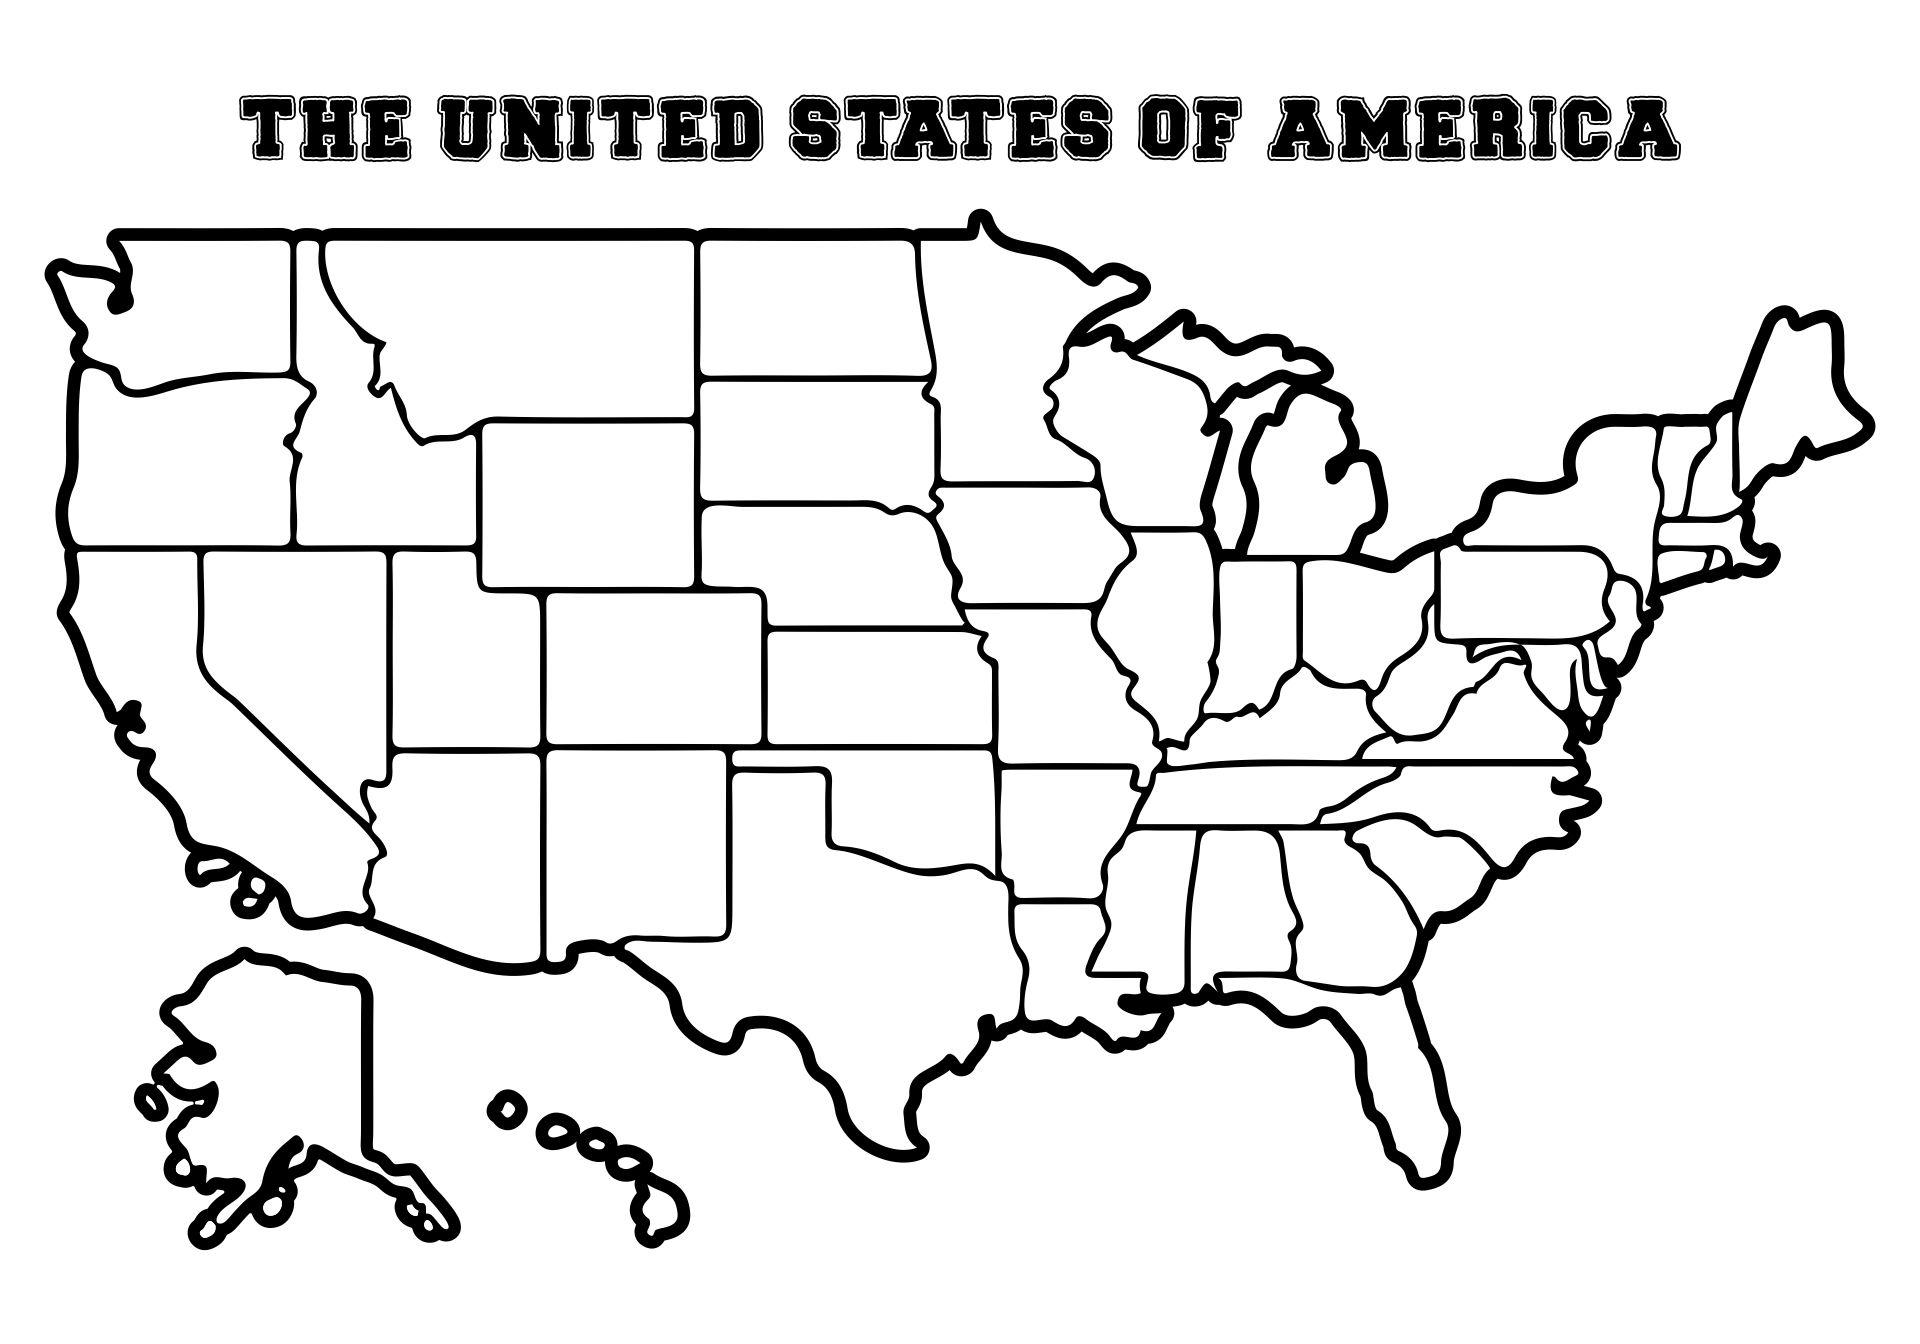 Worksheets United States Blank Map Worksheet map of usa 50 states blank worksheet molx united states